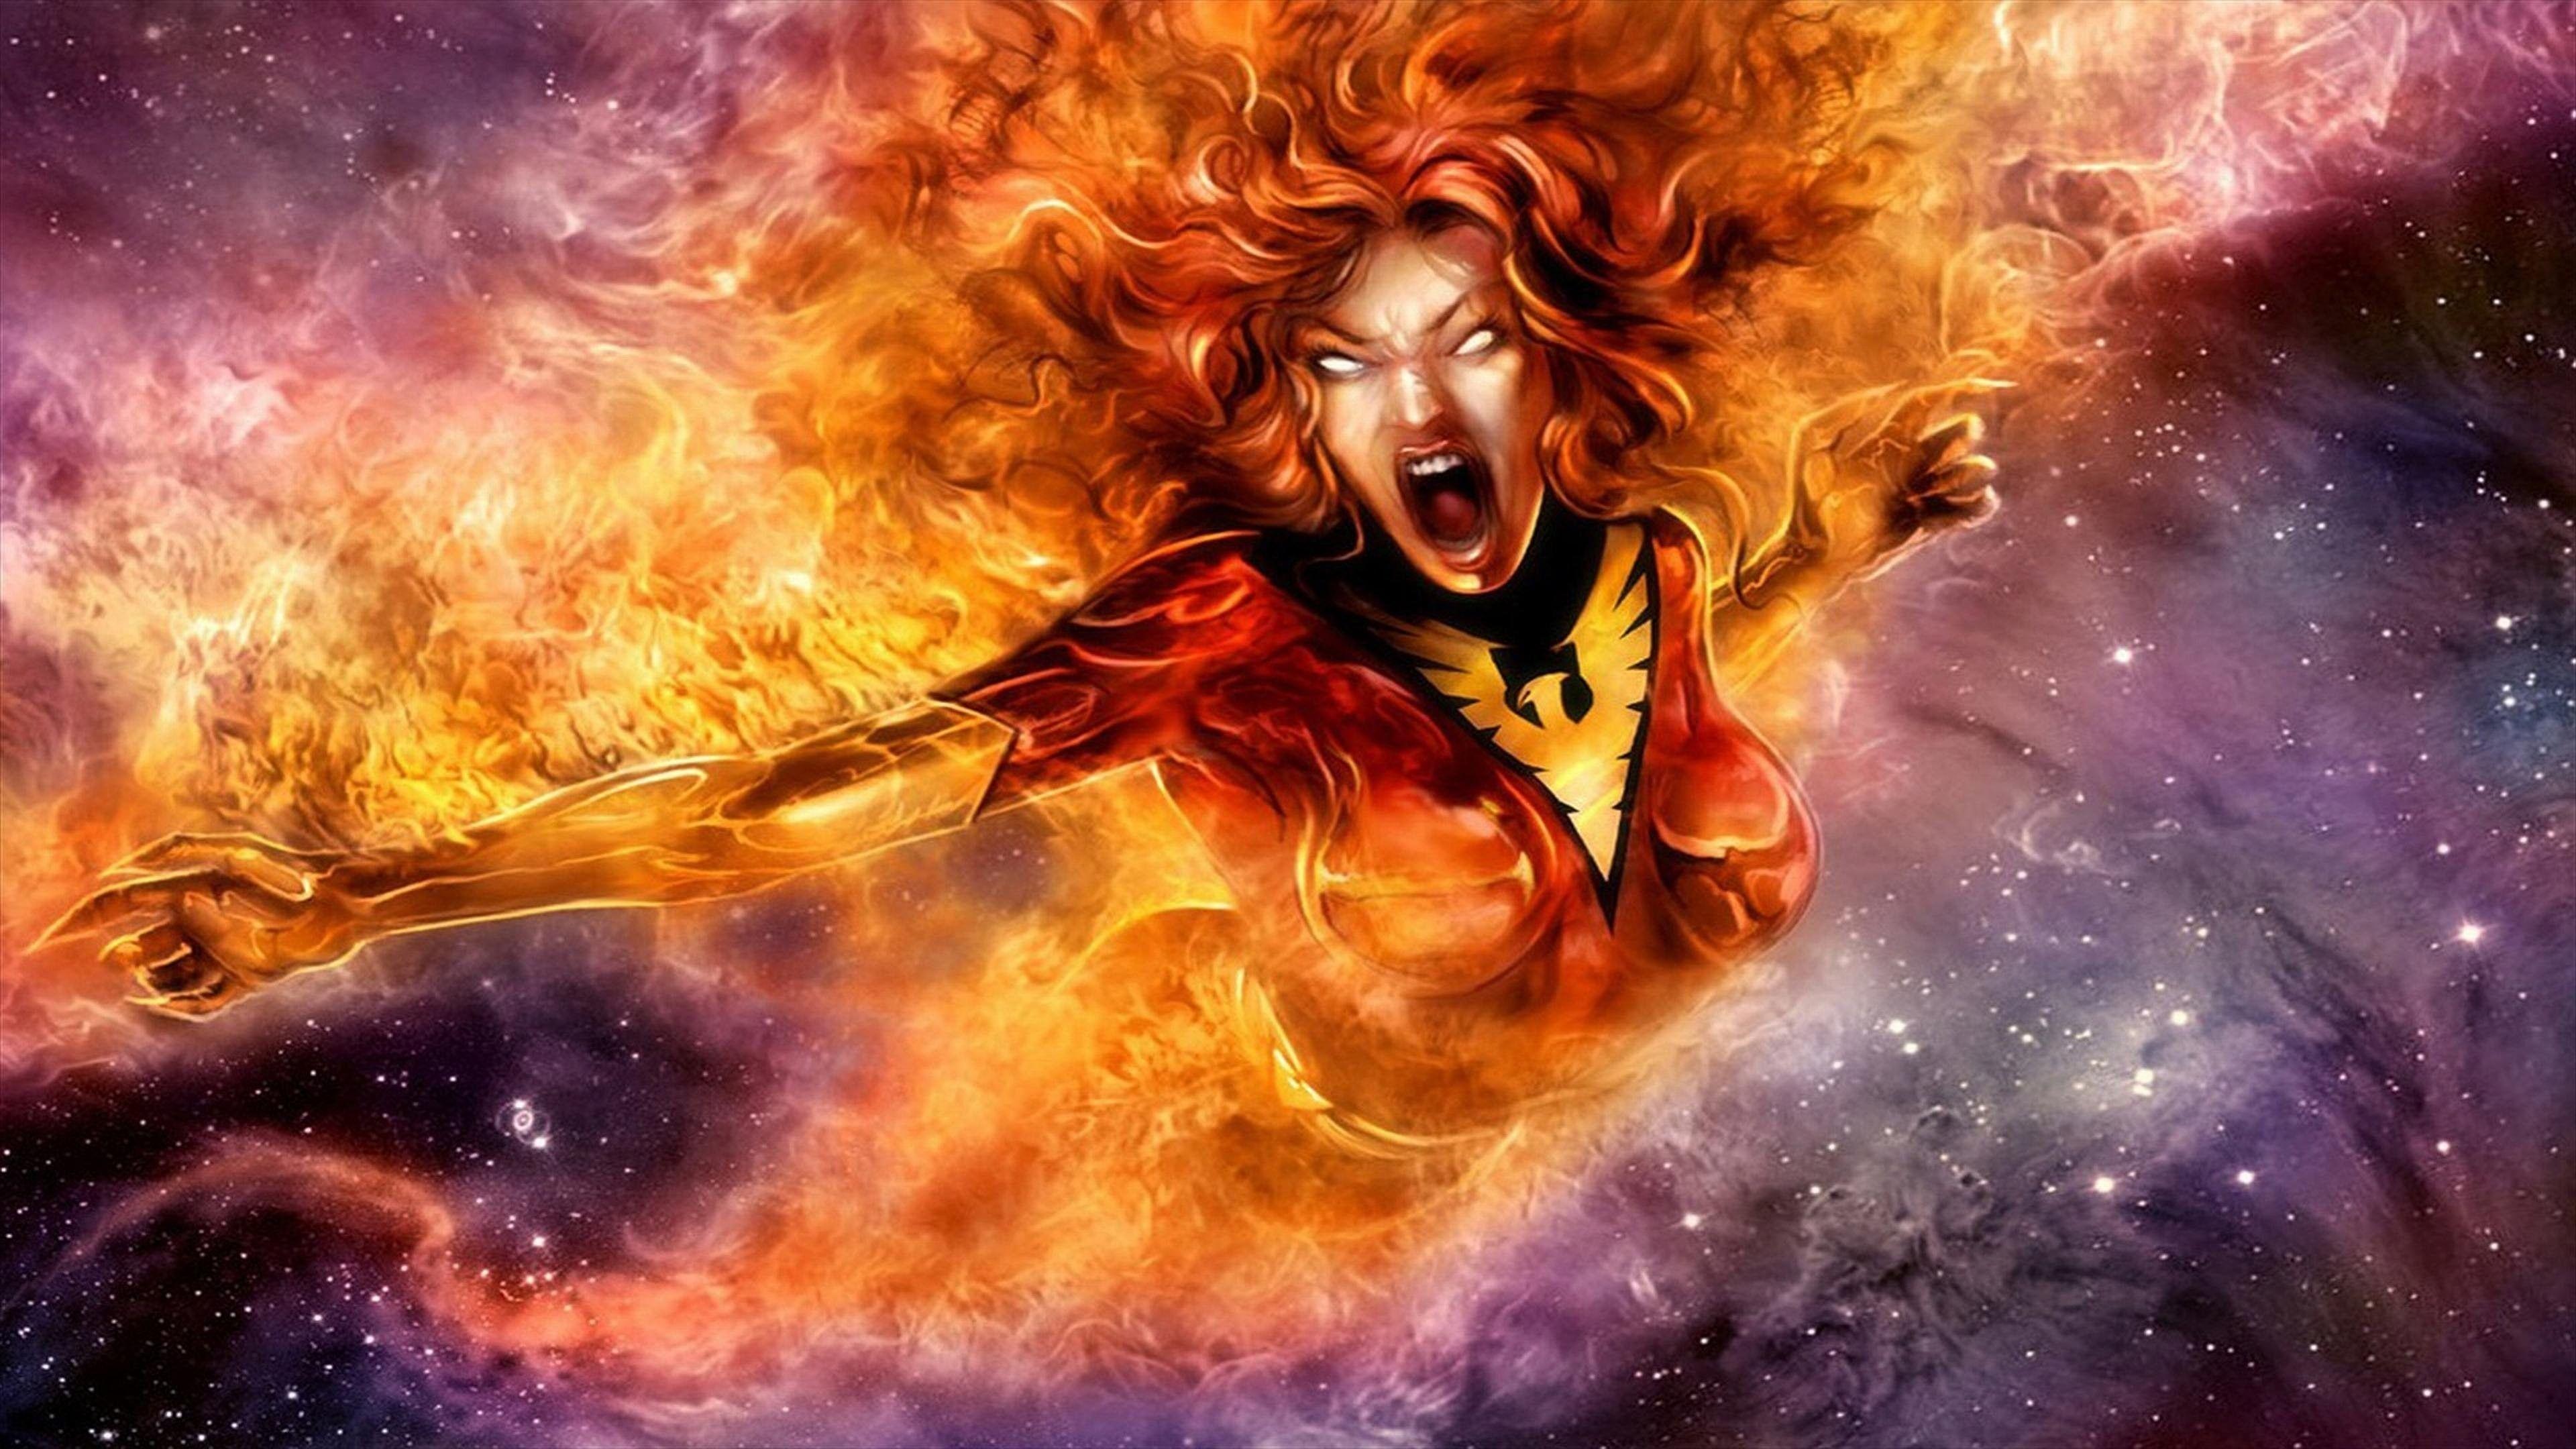 Marvel Phoenix Wallpapers Top Free Marvel Phoenix